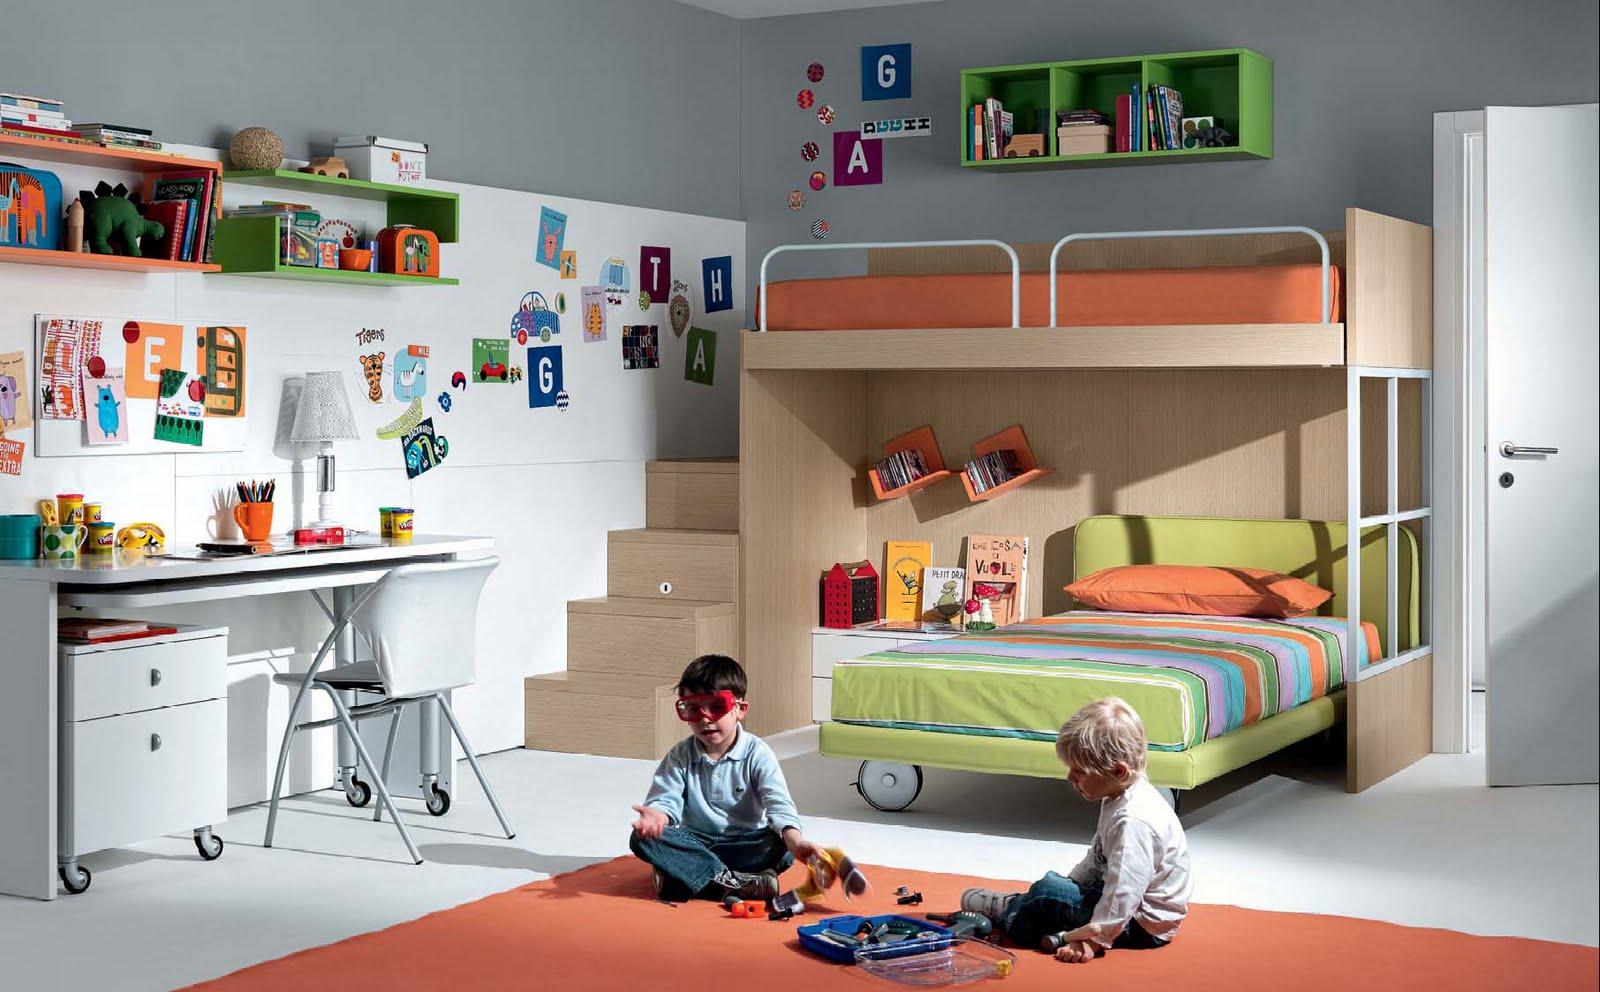 بالصور غرف نوم للاطفال , احدث غرف نوم للصغار 5142 11